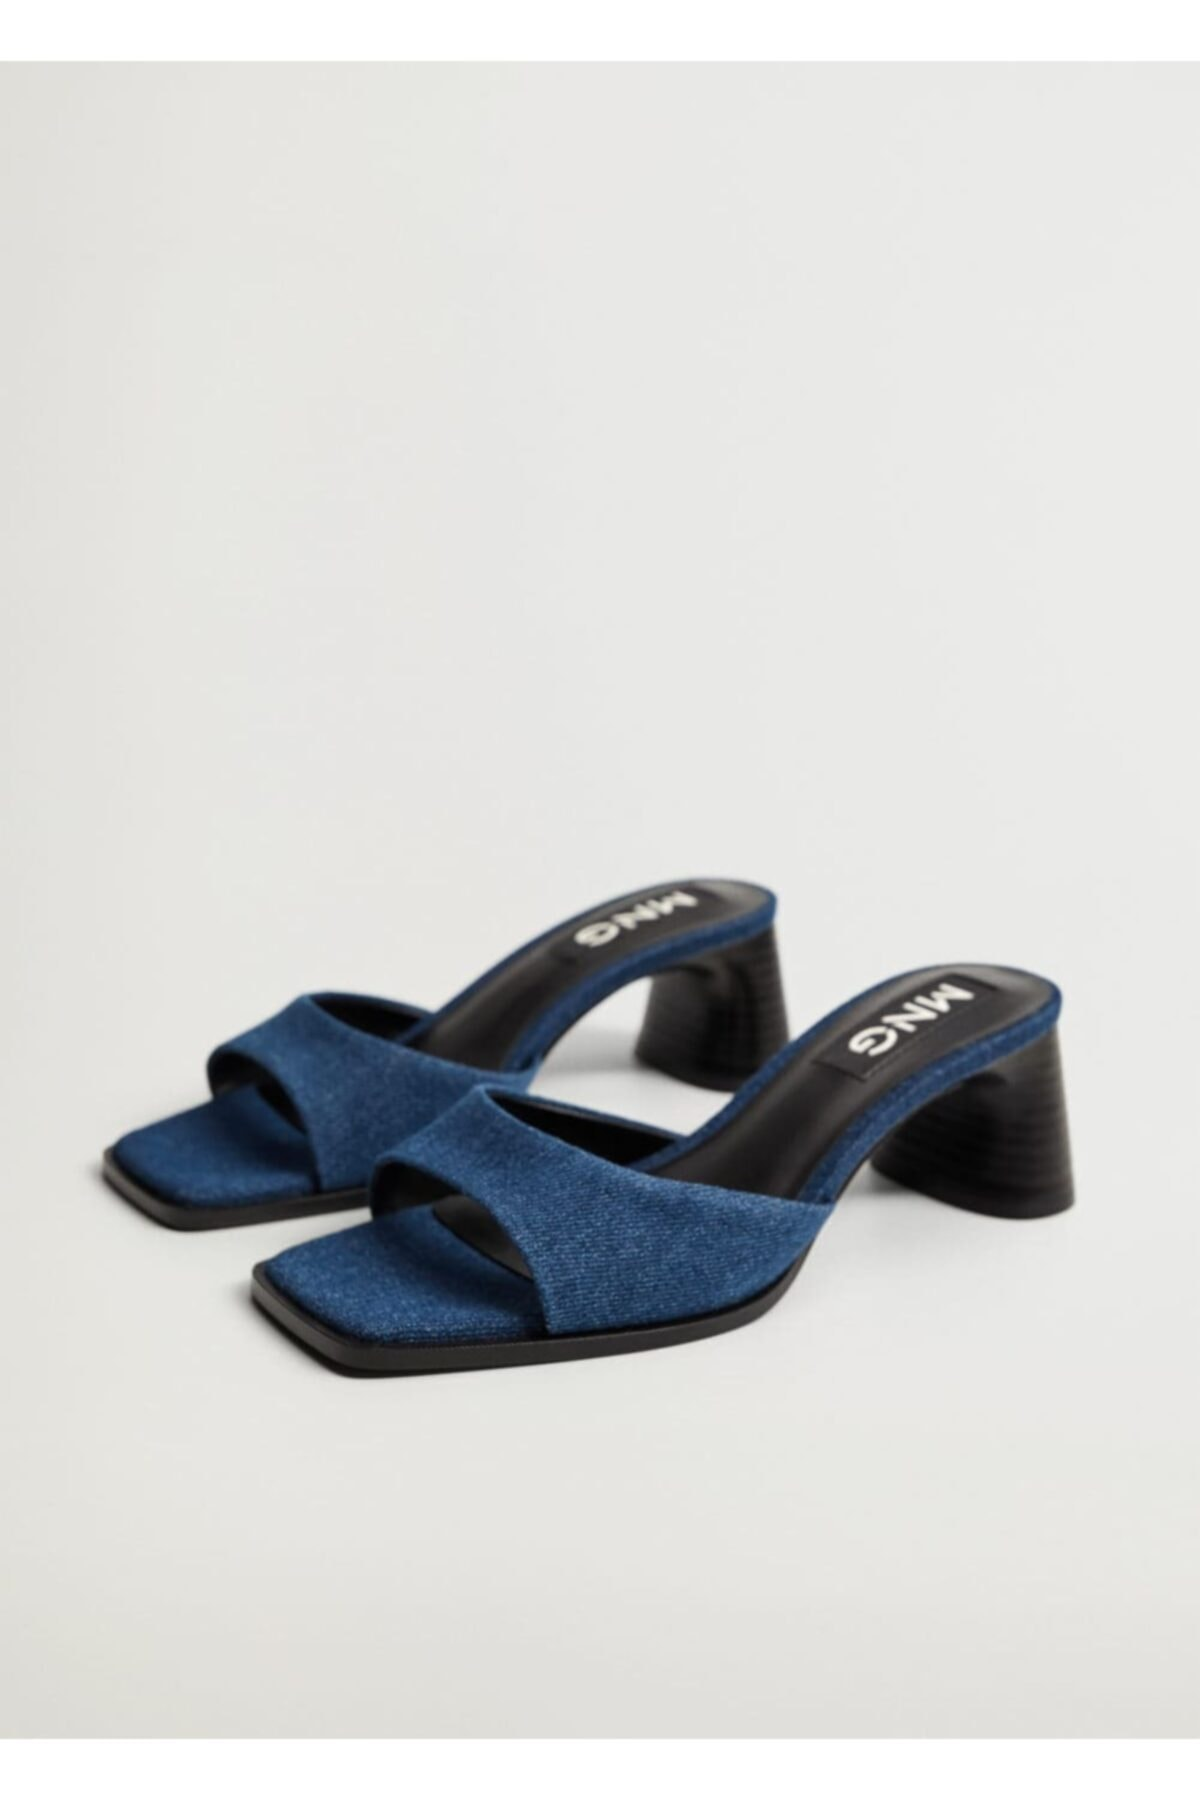 MANGO Woman Kadın Topuklu Kot Sandalet 1